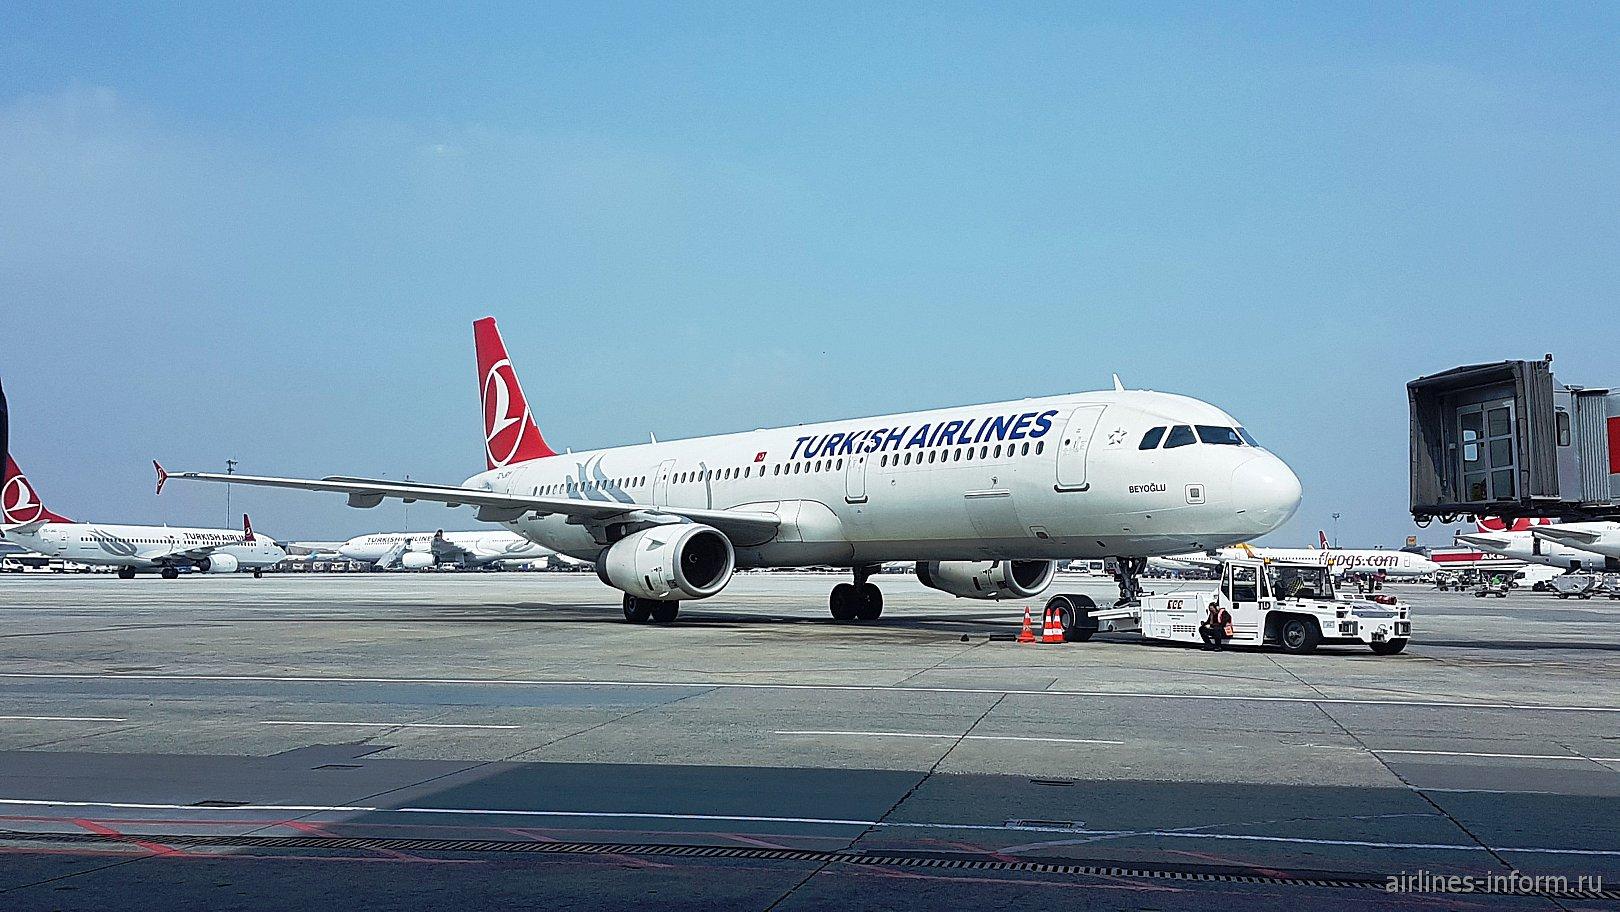 Airbus A321 Турецких авиалиний в аэропорту Стамбул Ататюрк